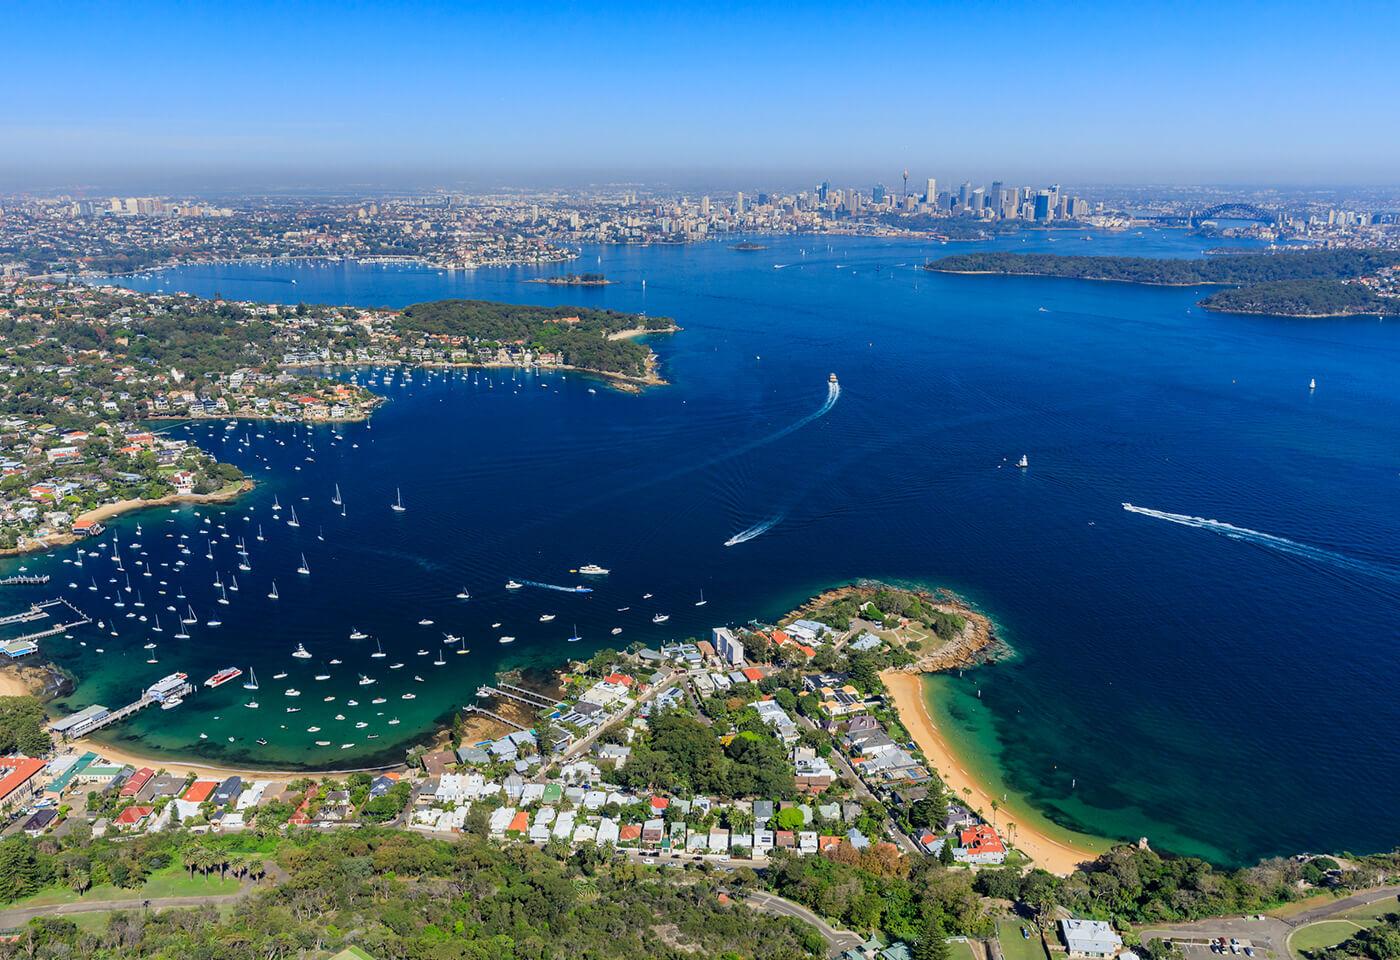 Aerial image of Sydney Harbour